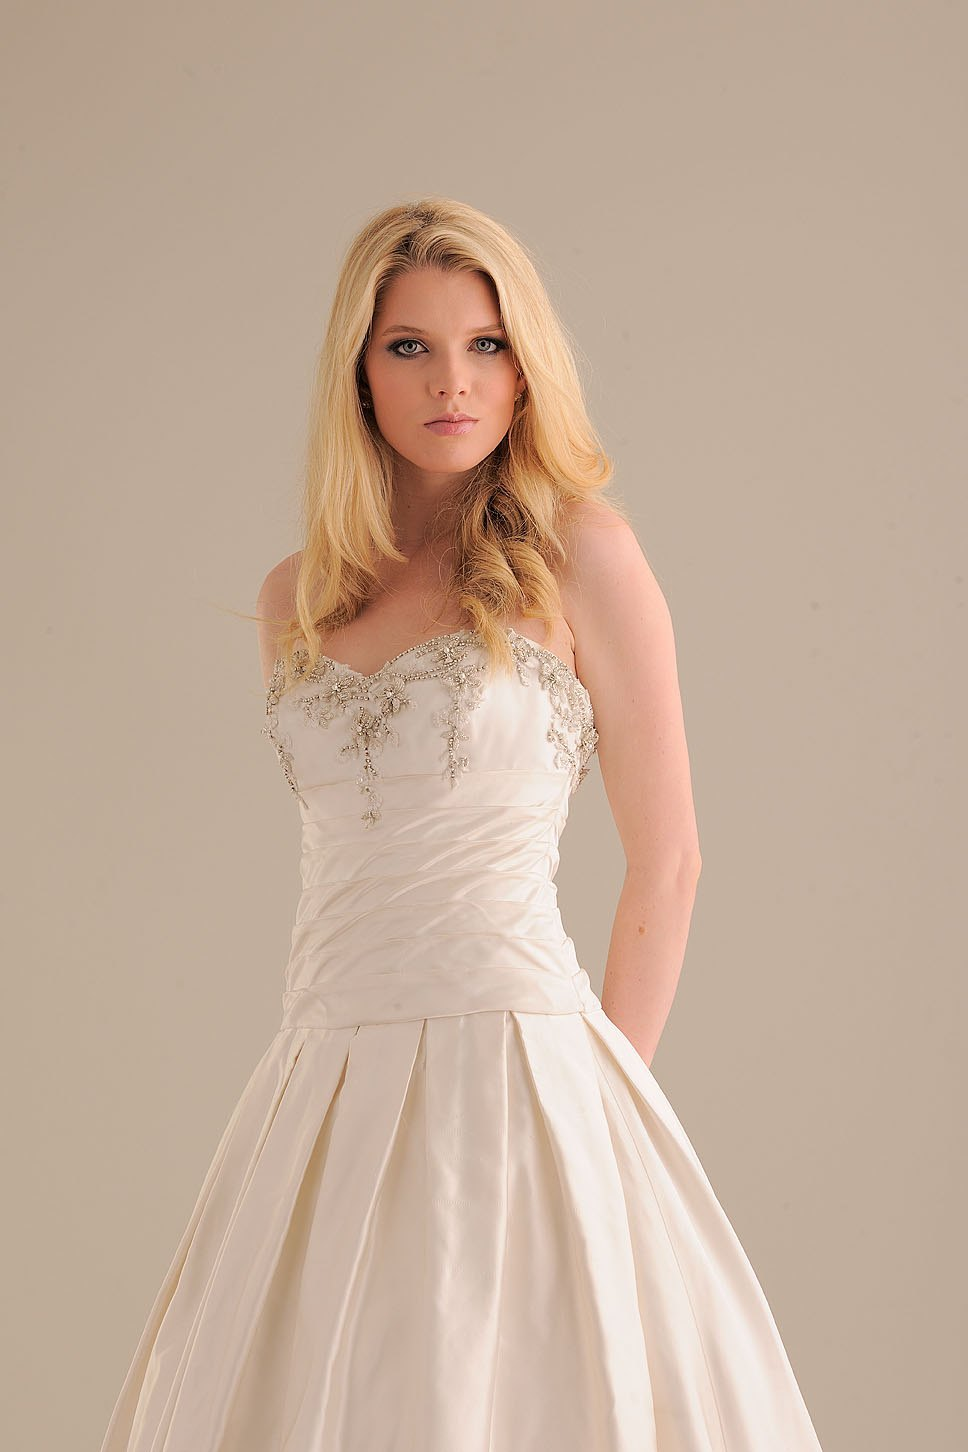 No-ordinary-bride-wedding-dress-831-detail.full